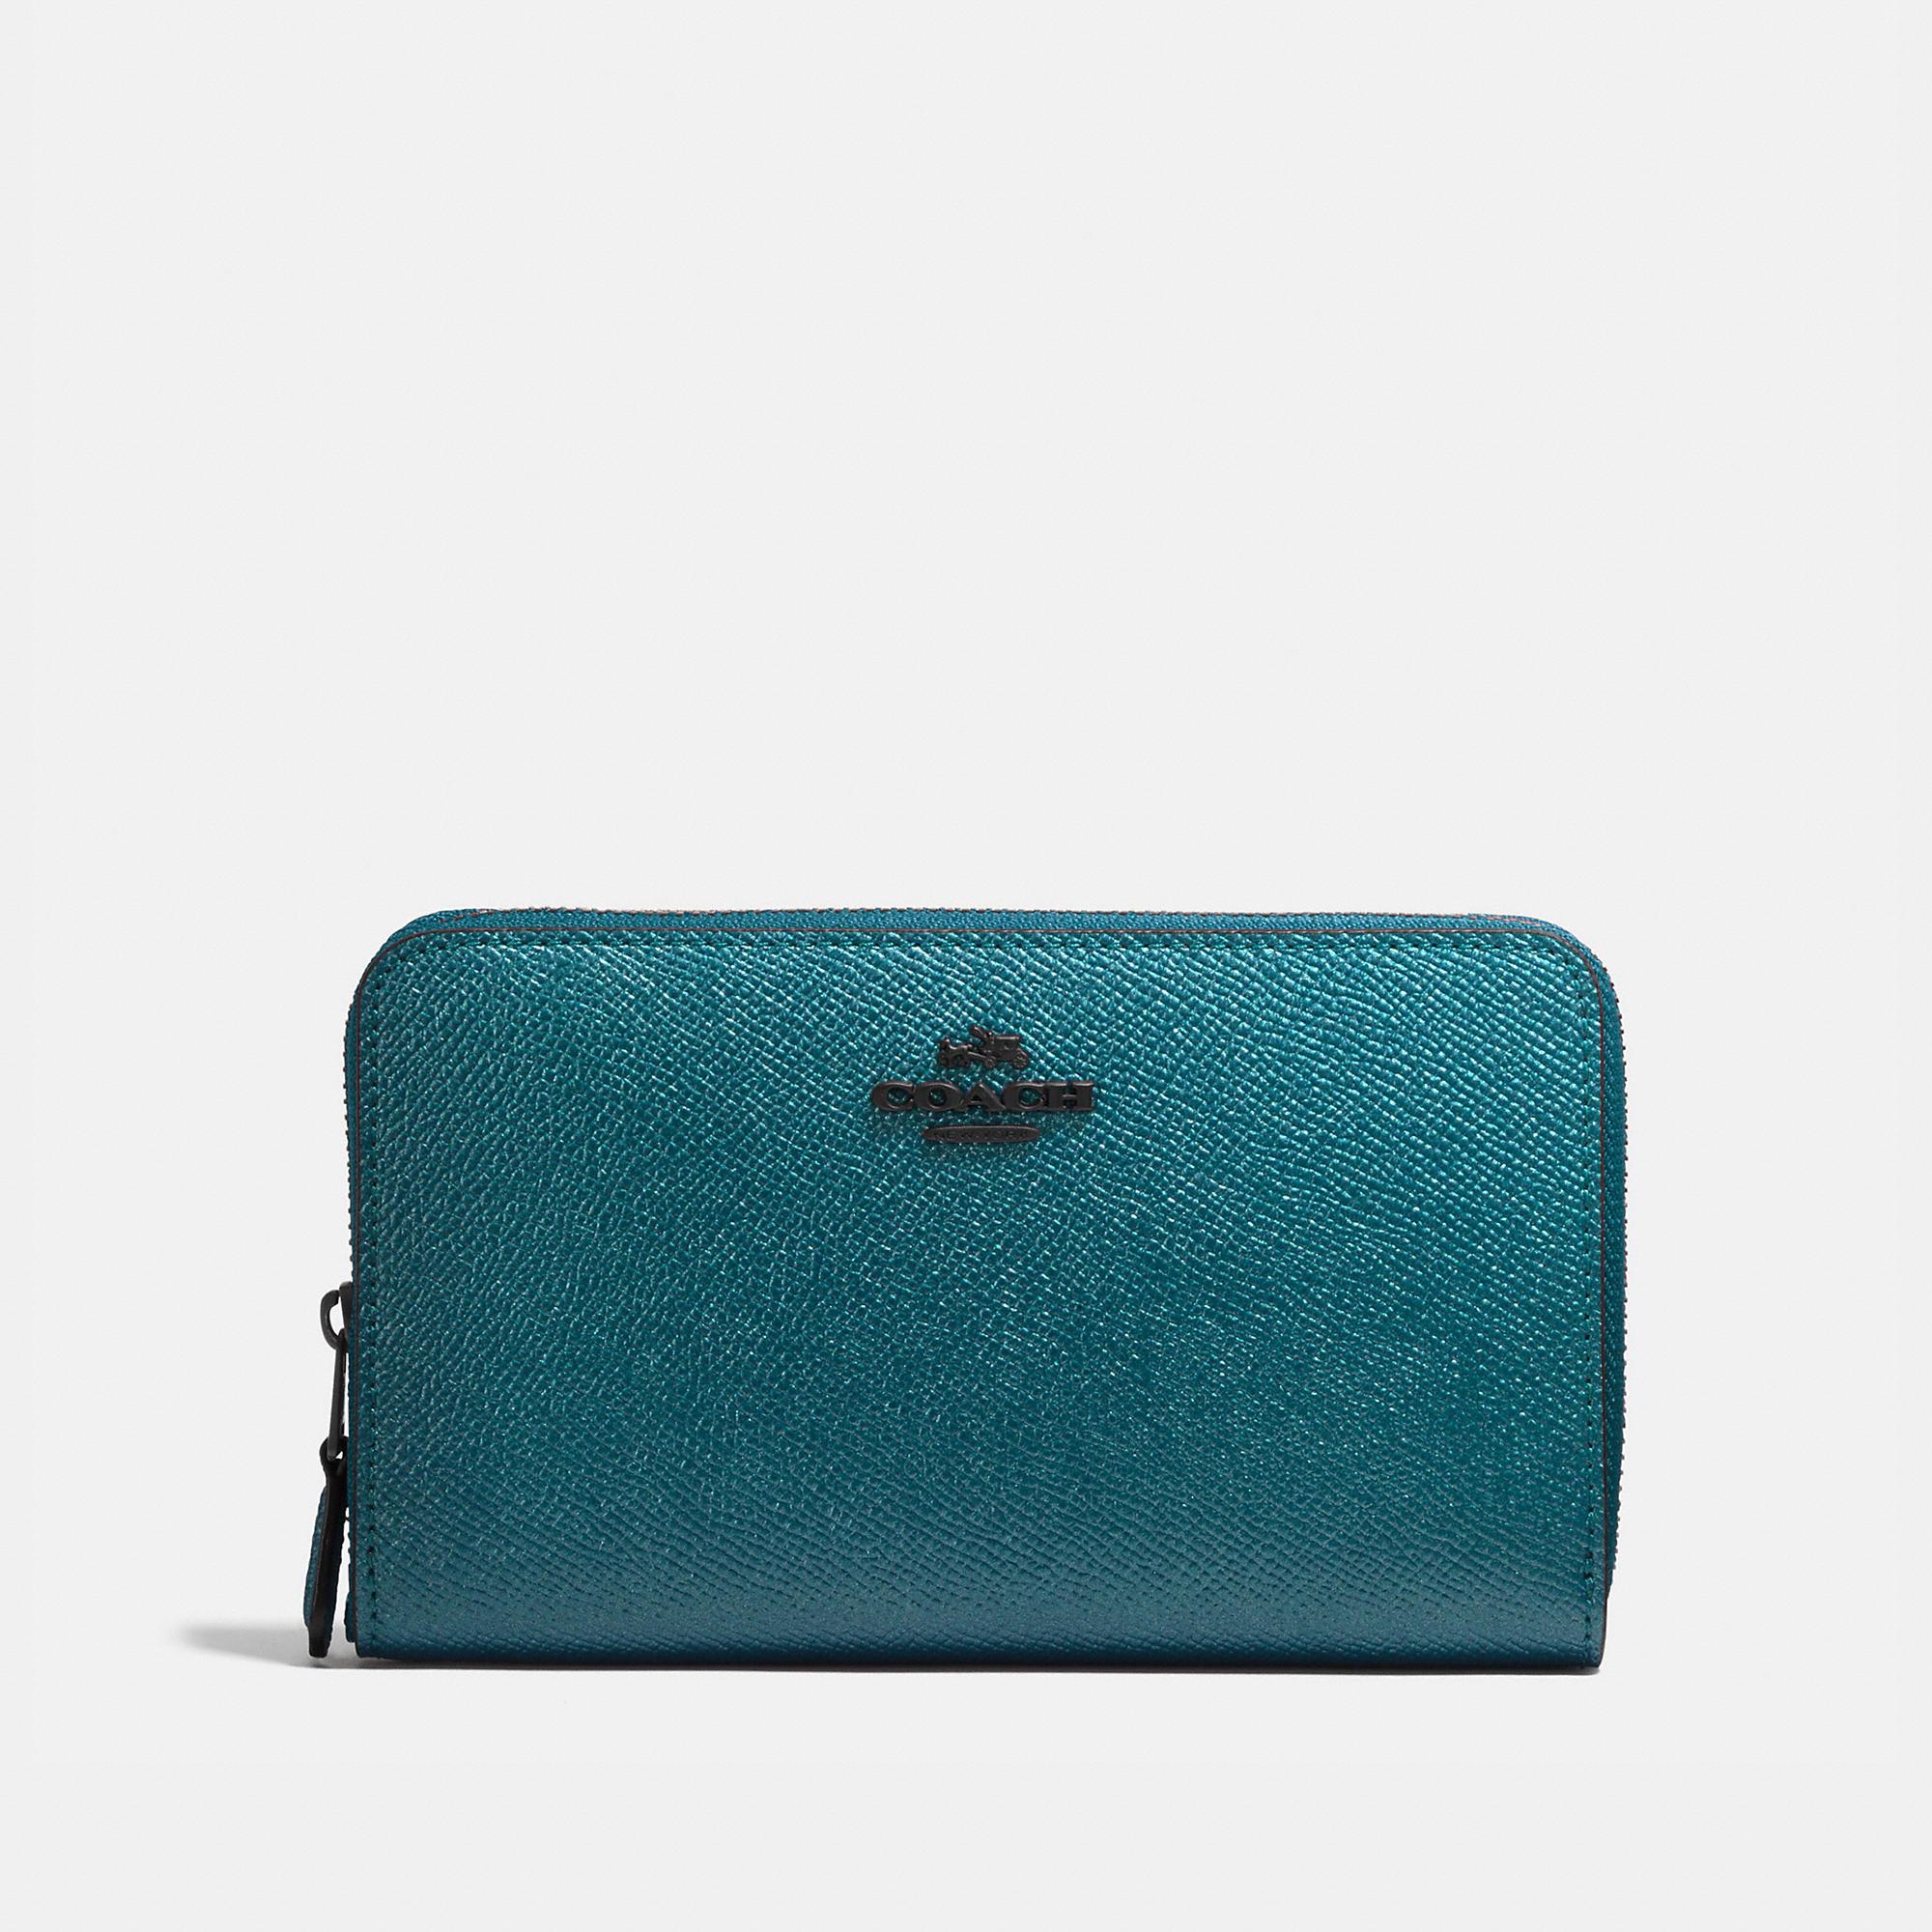 Coach Medium Zip Around Wallet In Metallic Leather